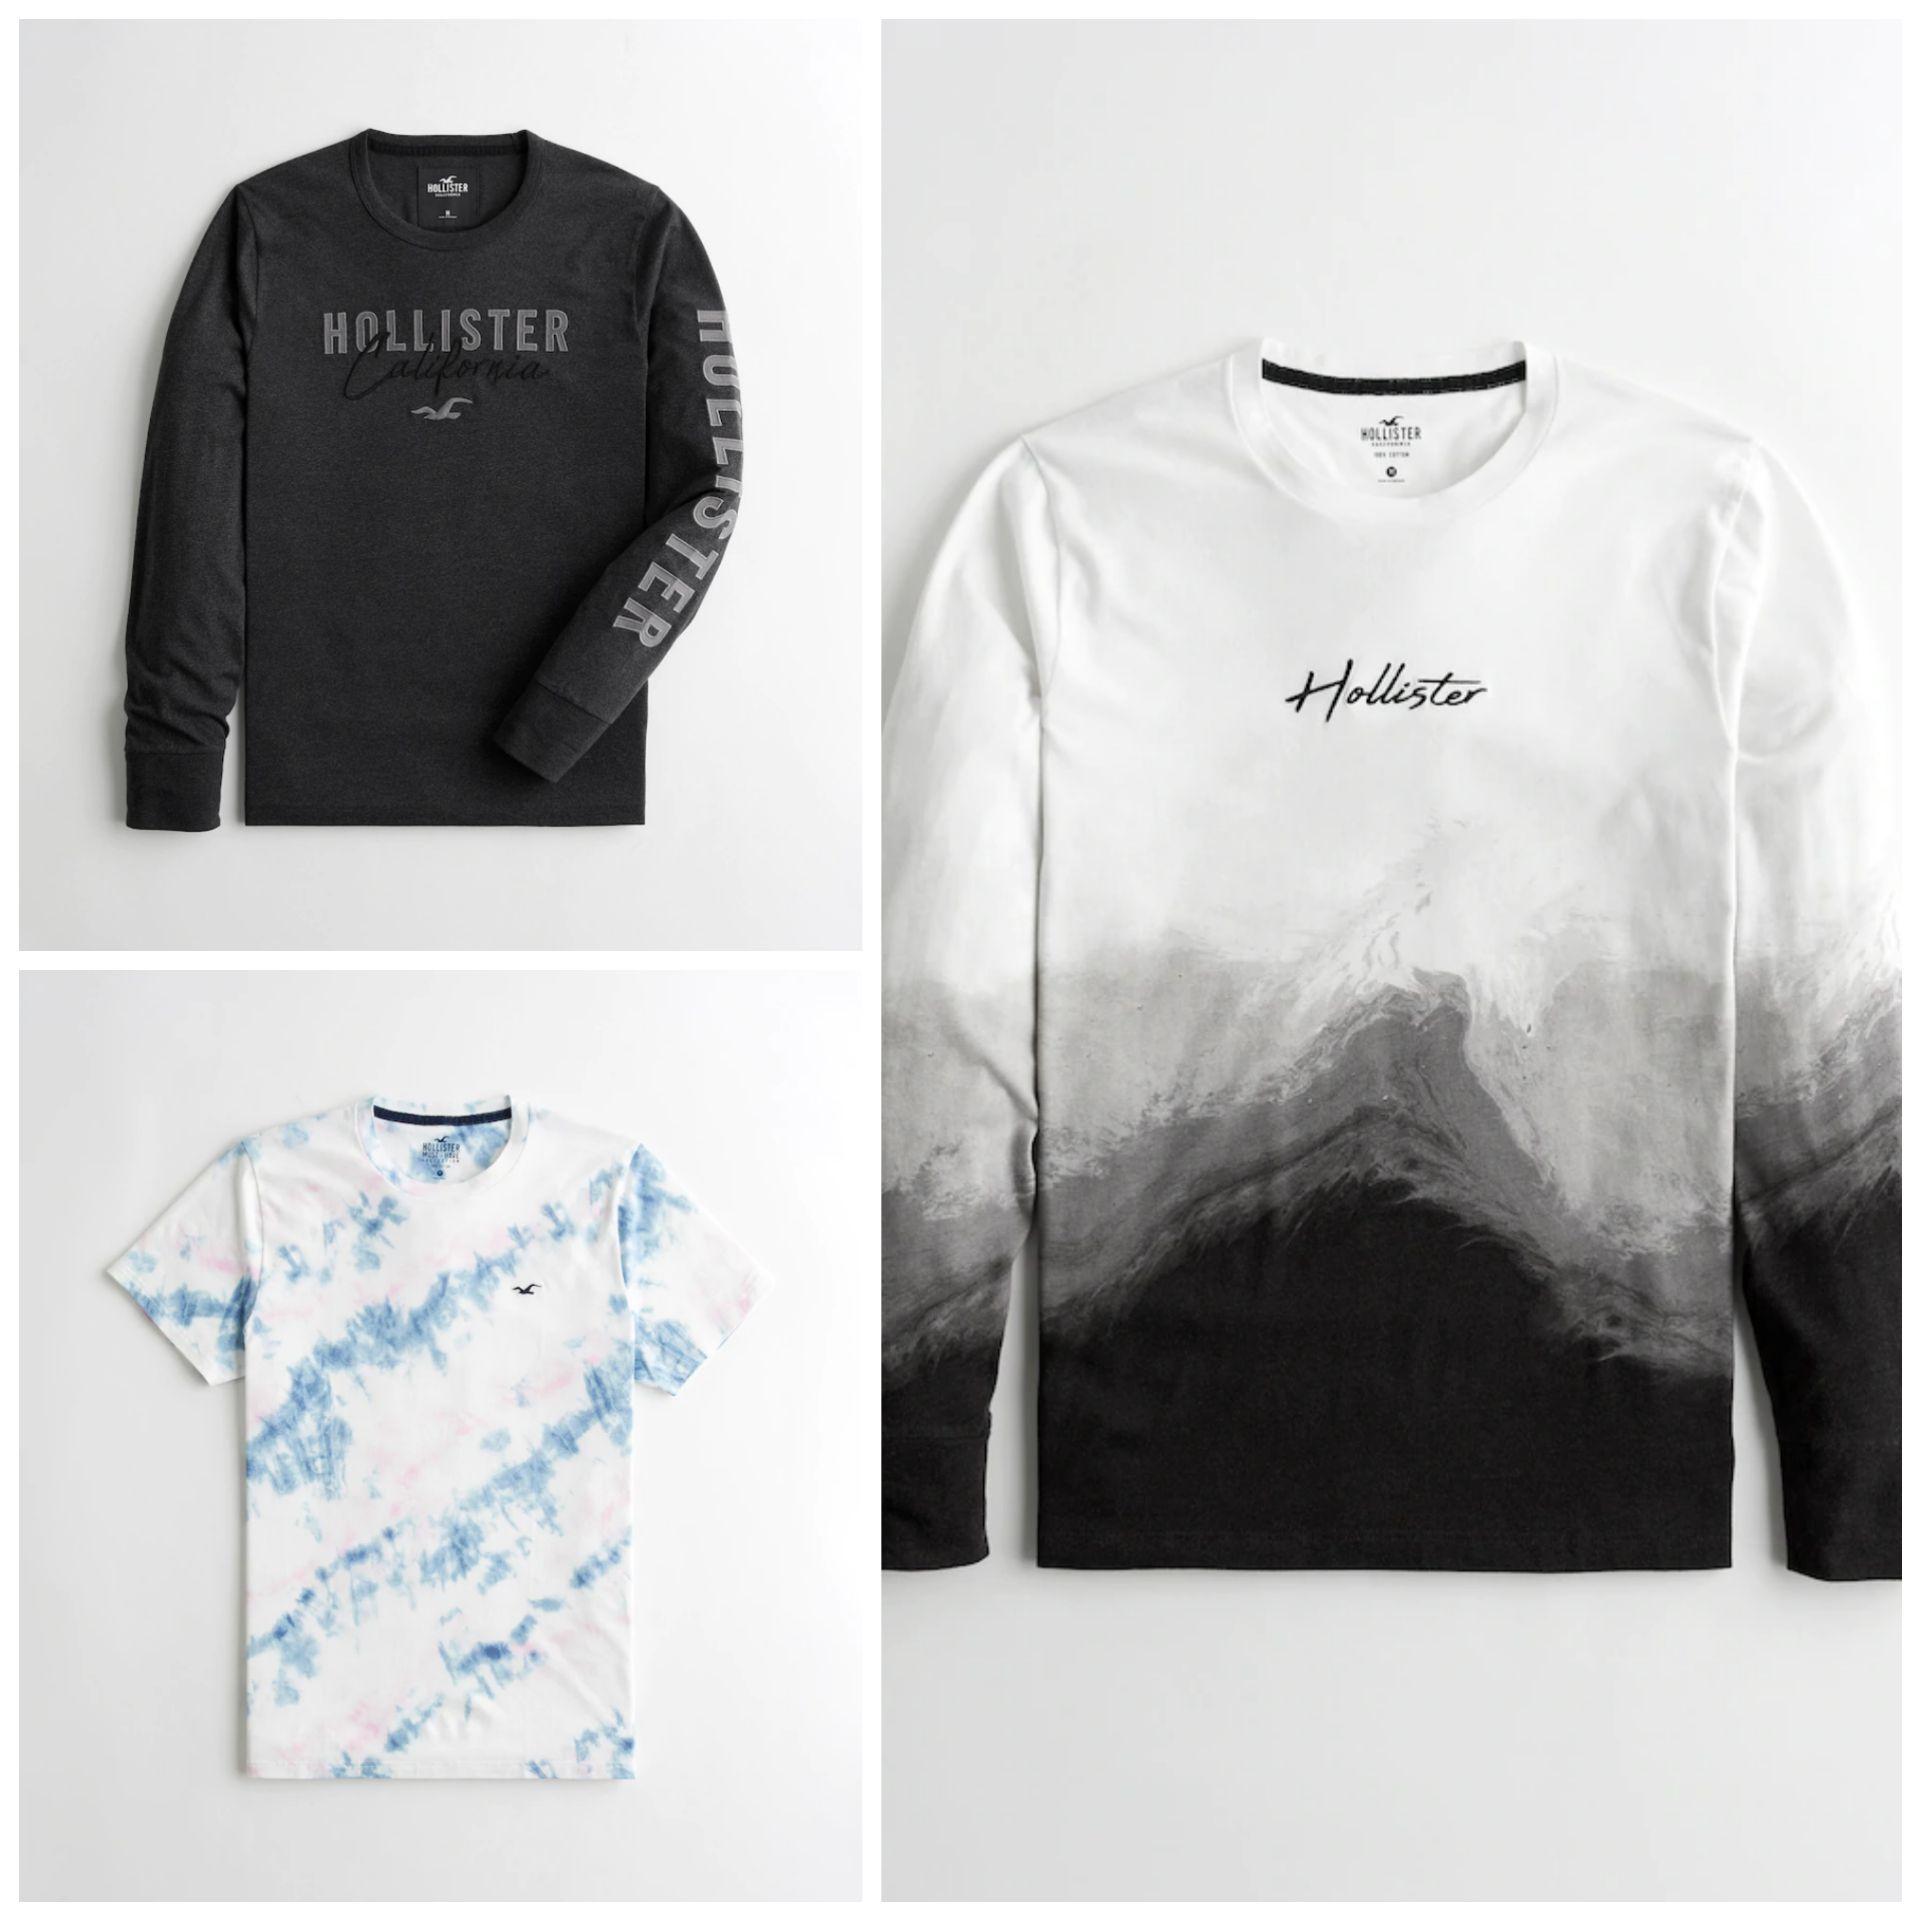 Camisetas Hollister para Hombre por menos de 10€ (Varios modelos en descripción)